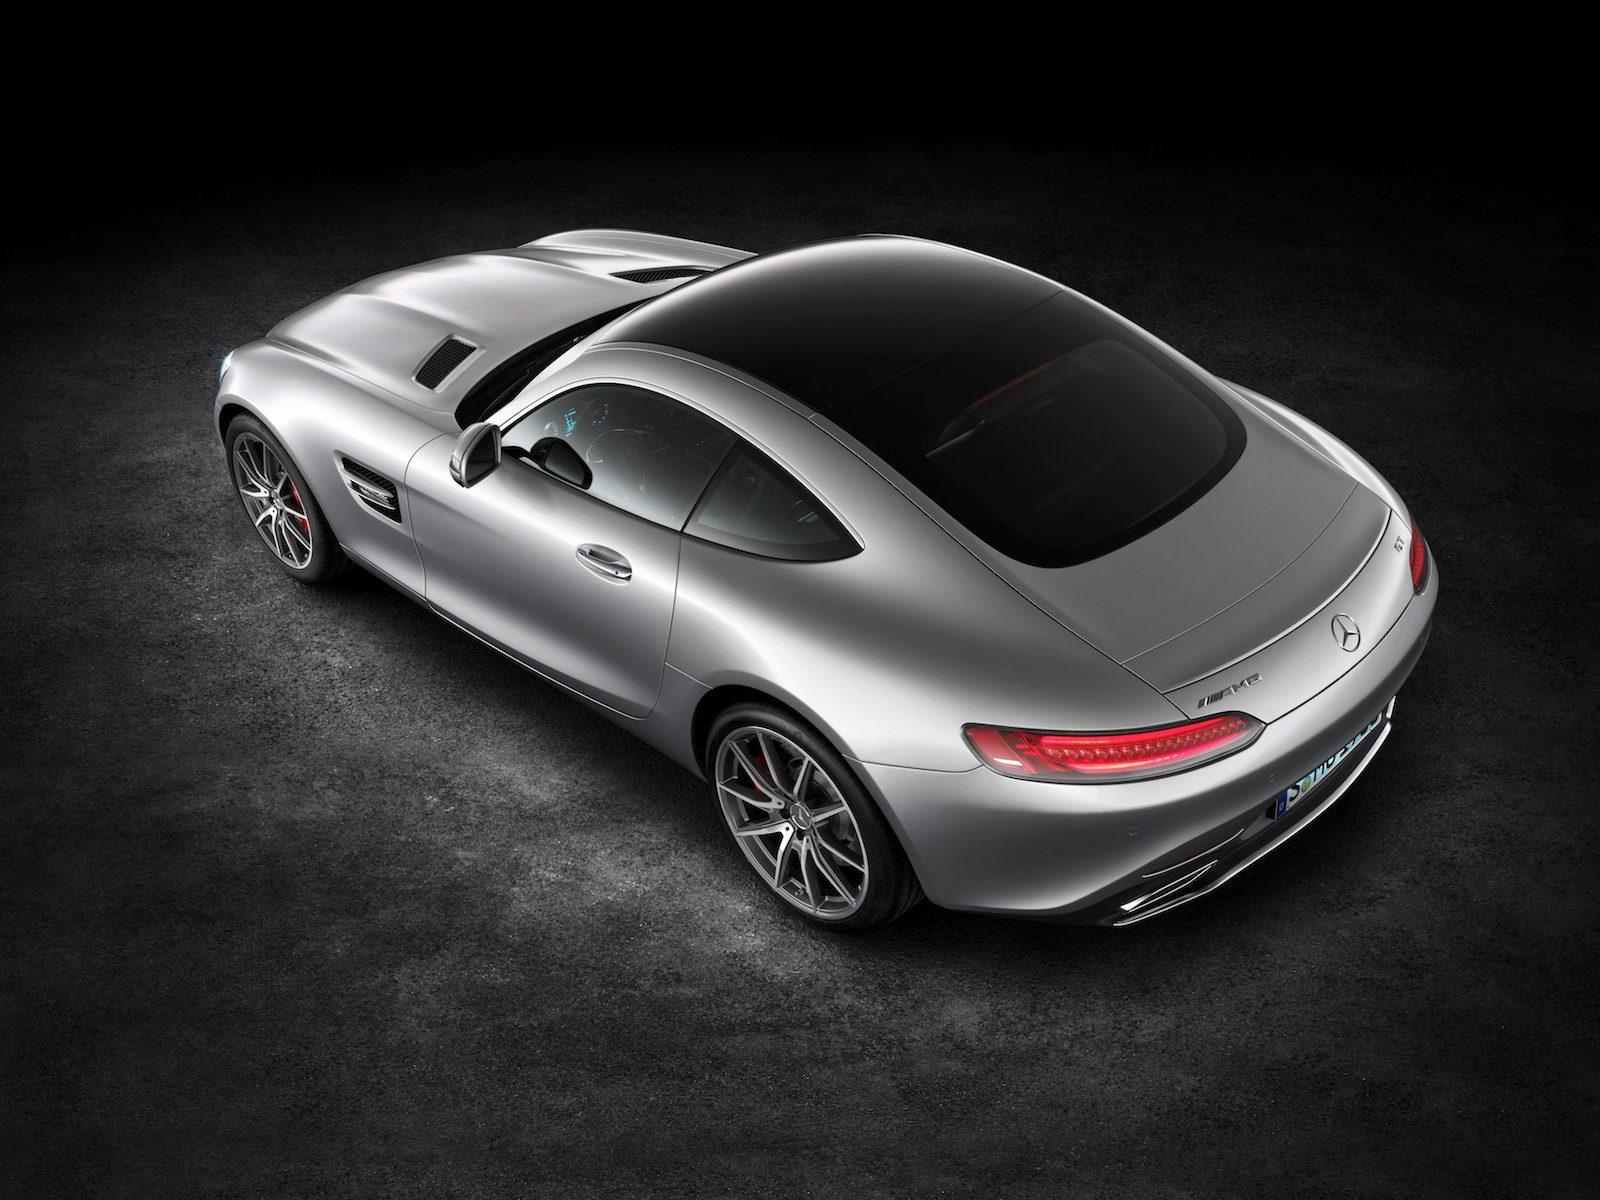 GT Mercedes  New Mercedes-Benz AMG GT  10514201 10152716492311670 7113848770553998580 o